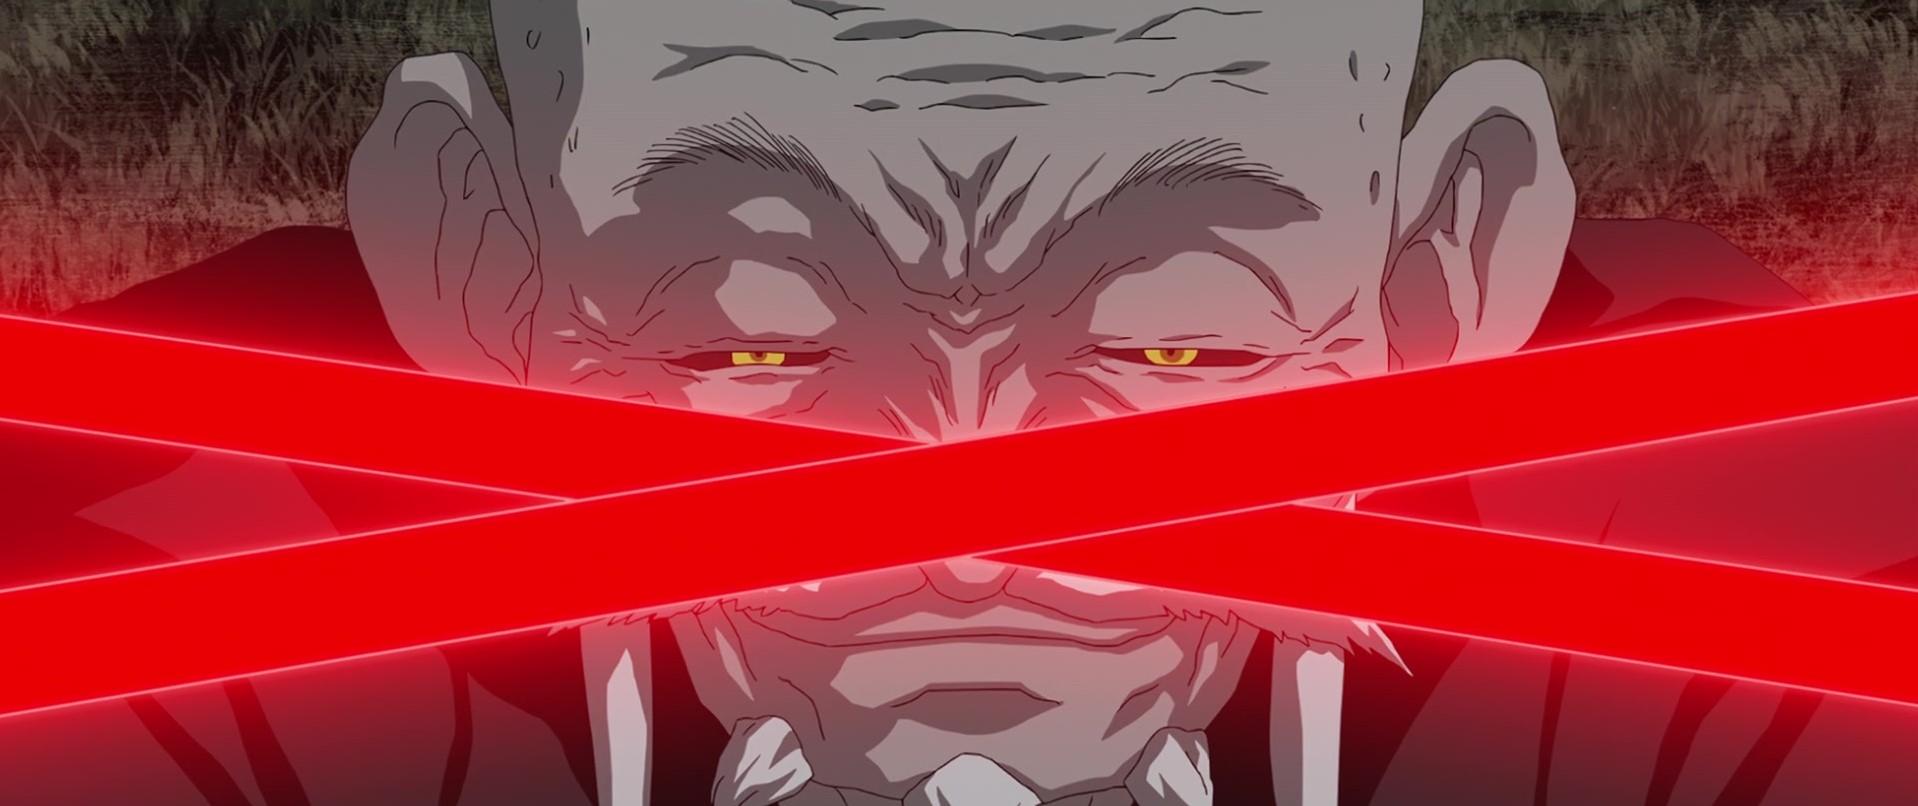 star wars visions the elder